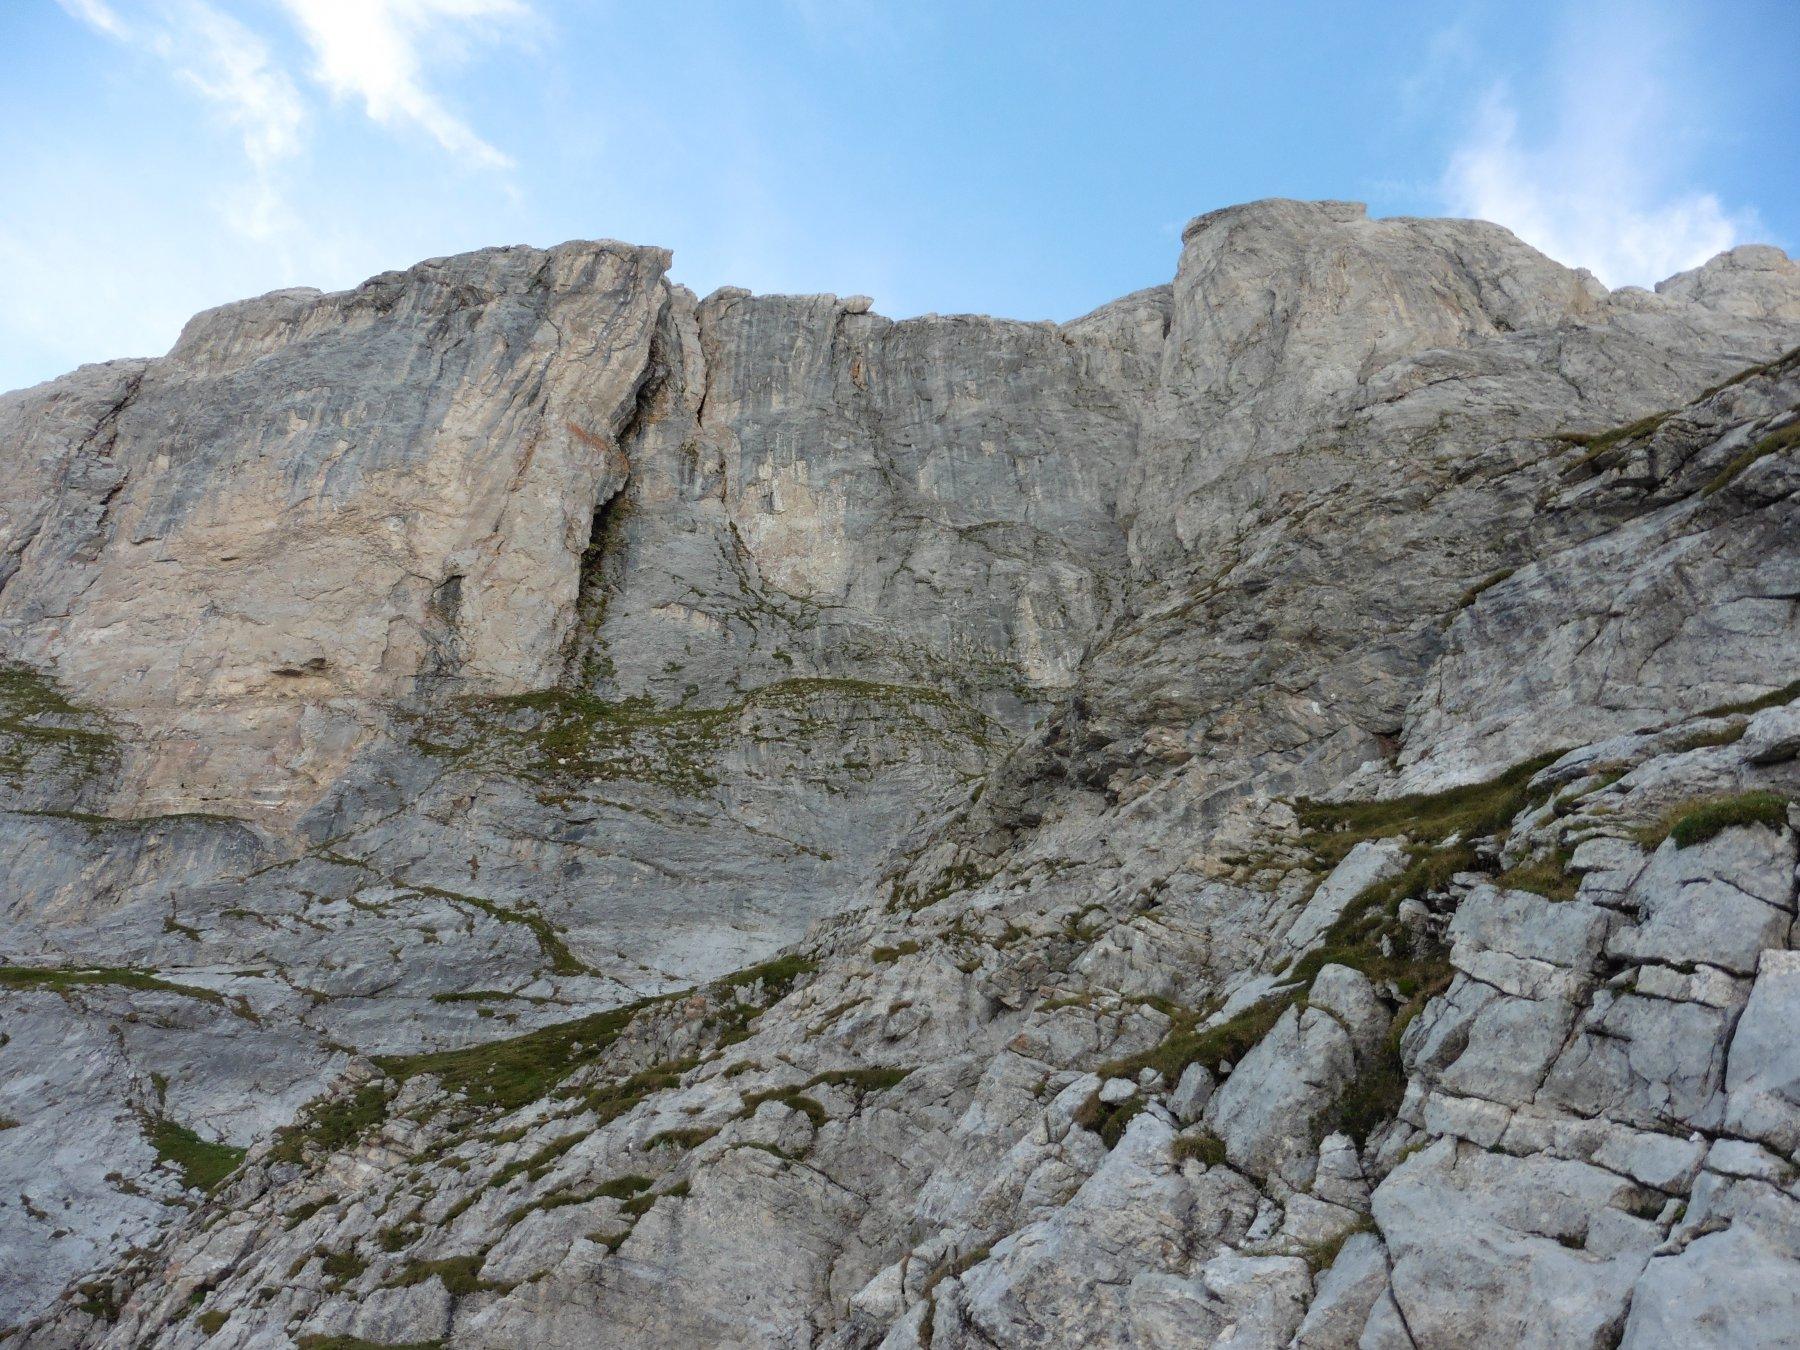 Saline (Cima delle) Via Aureli Mattioli 2016-09-04